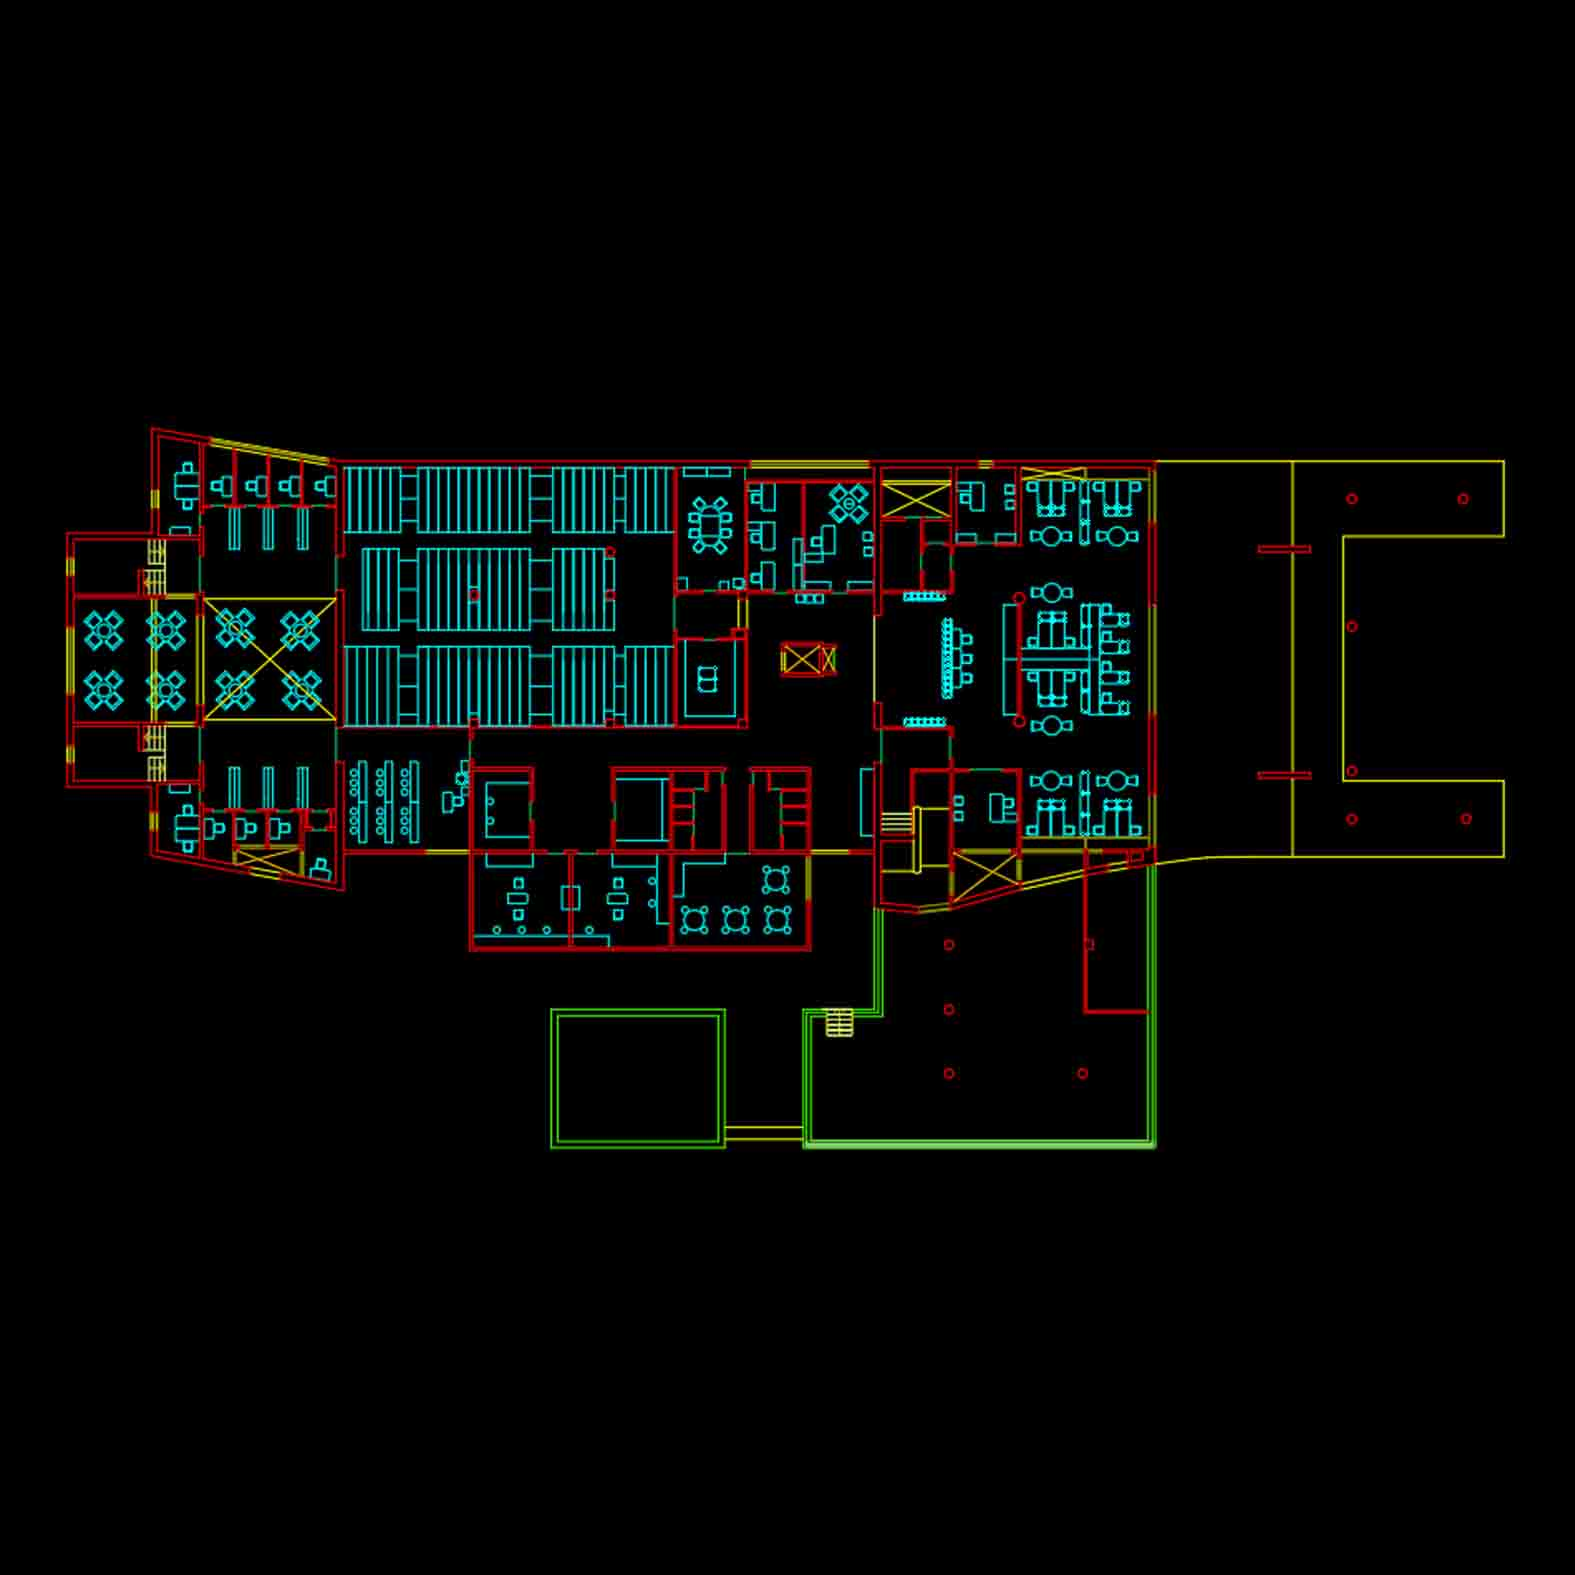 Plano: Biblioteca Aveiro / Alvaro Siza